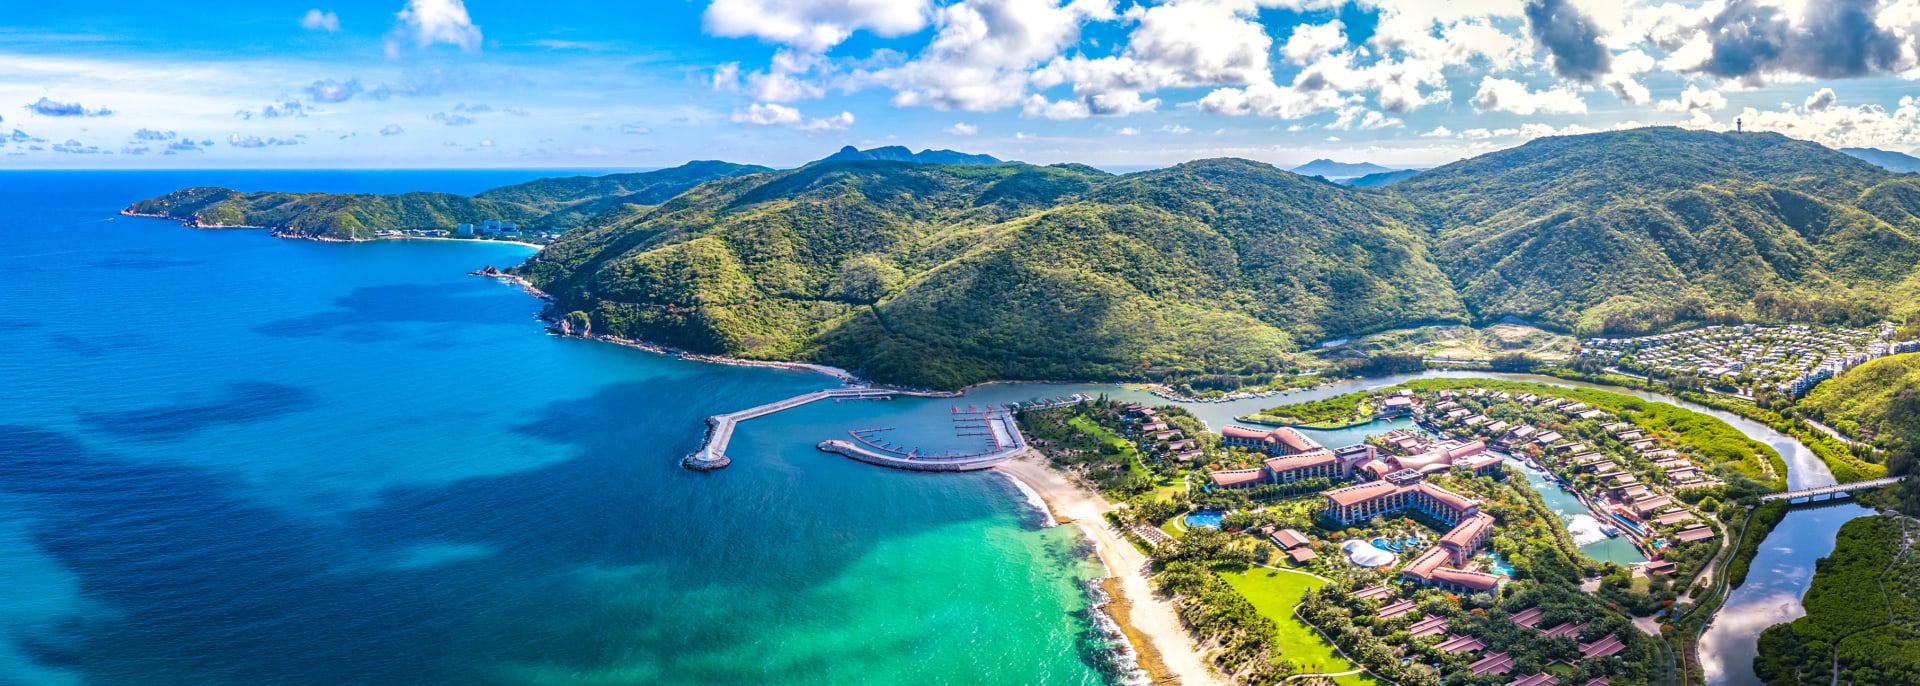 Yalong Bay, Sanya, Hainan Island, China